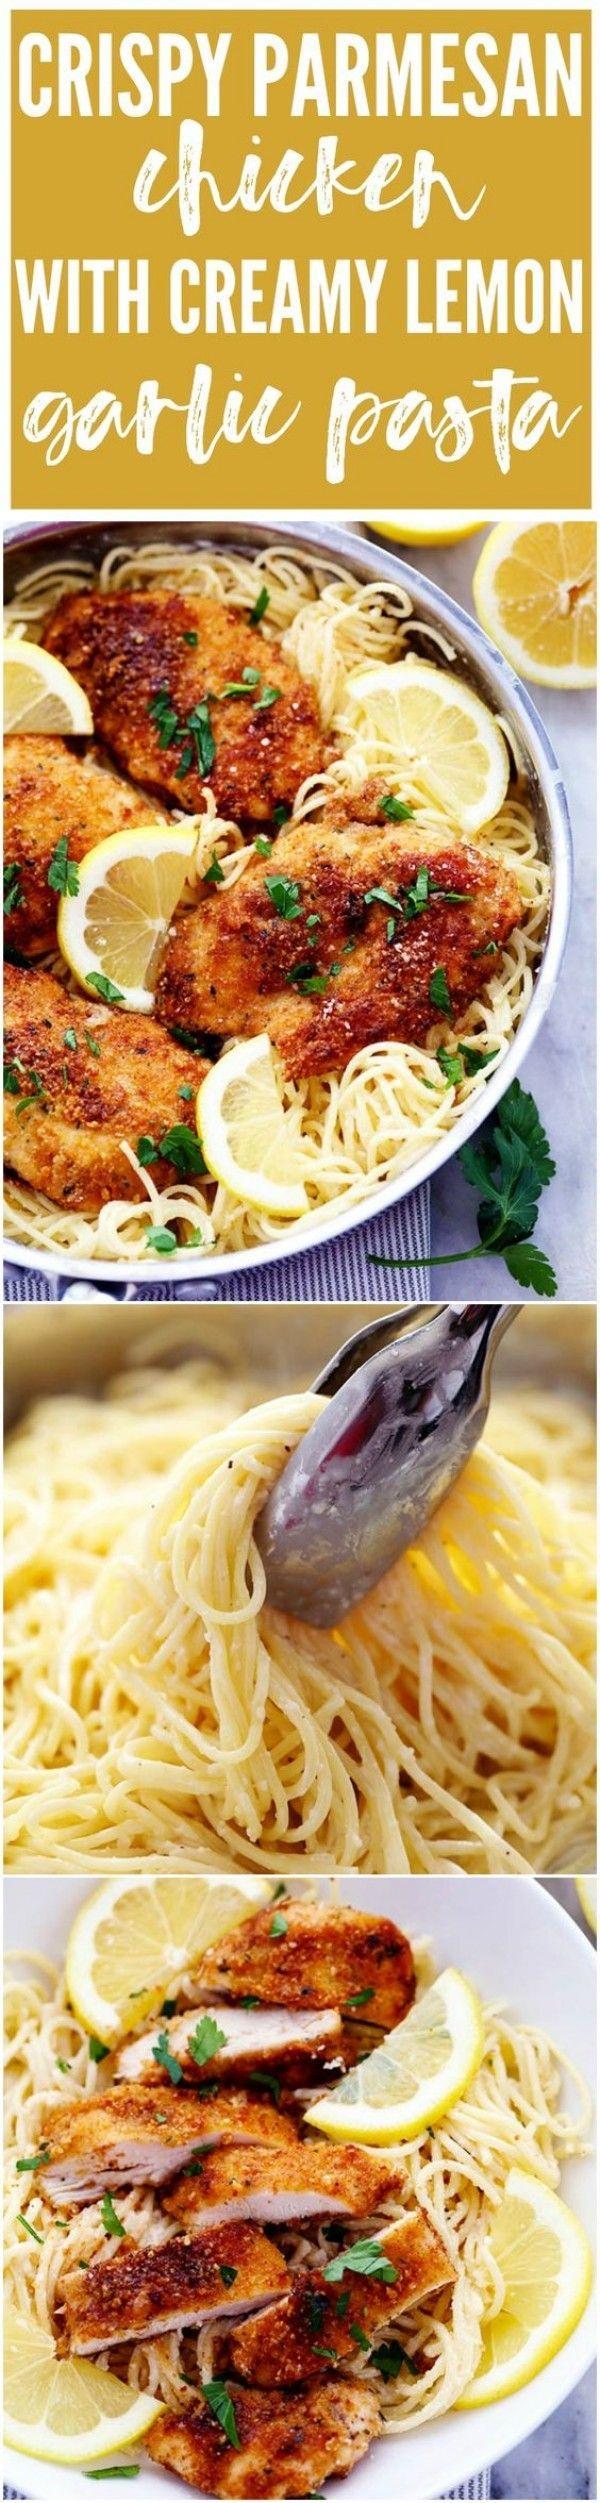 Get the recipe Crispy Parmesan Chicken with Creamy Lemon Garlic Pasta @recipes_to_go